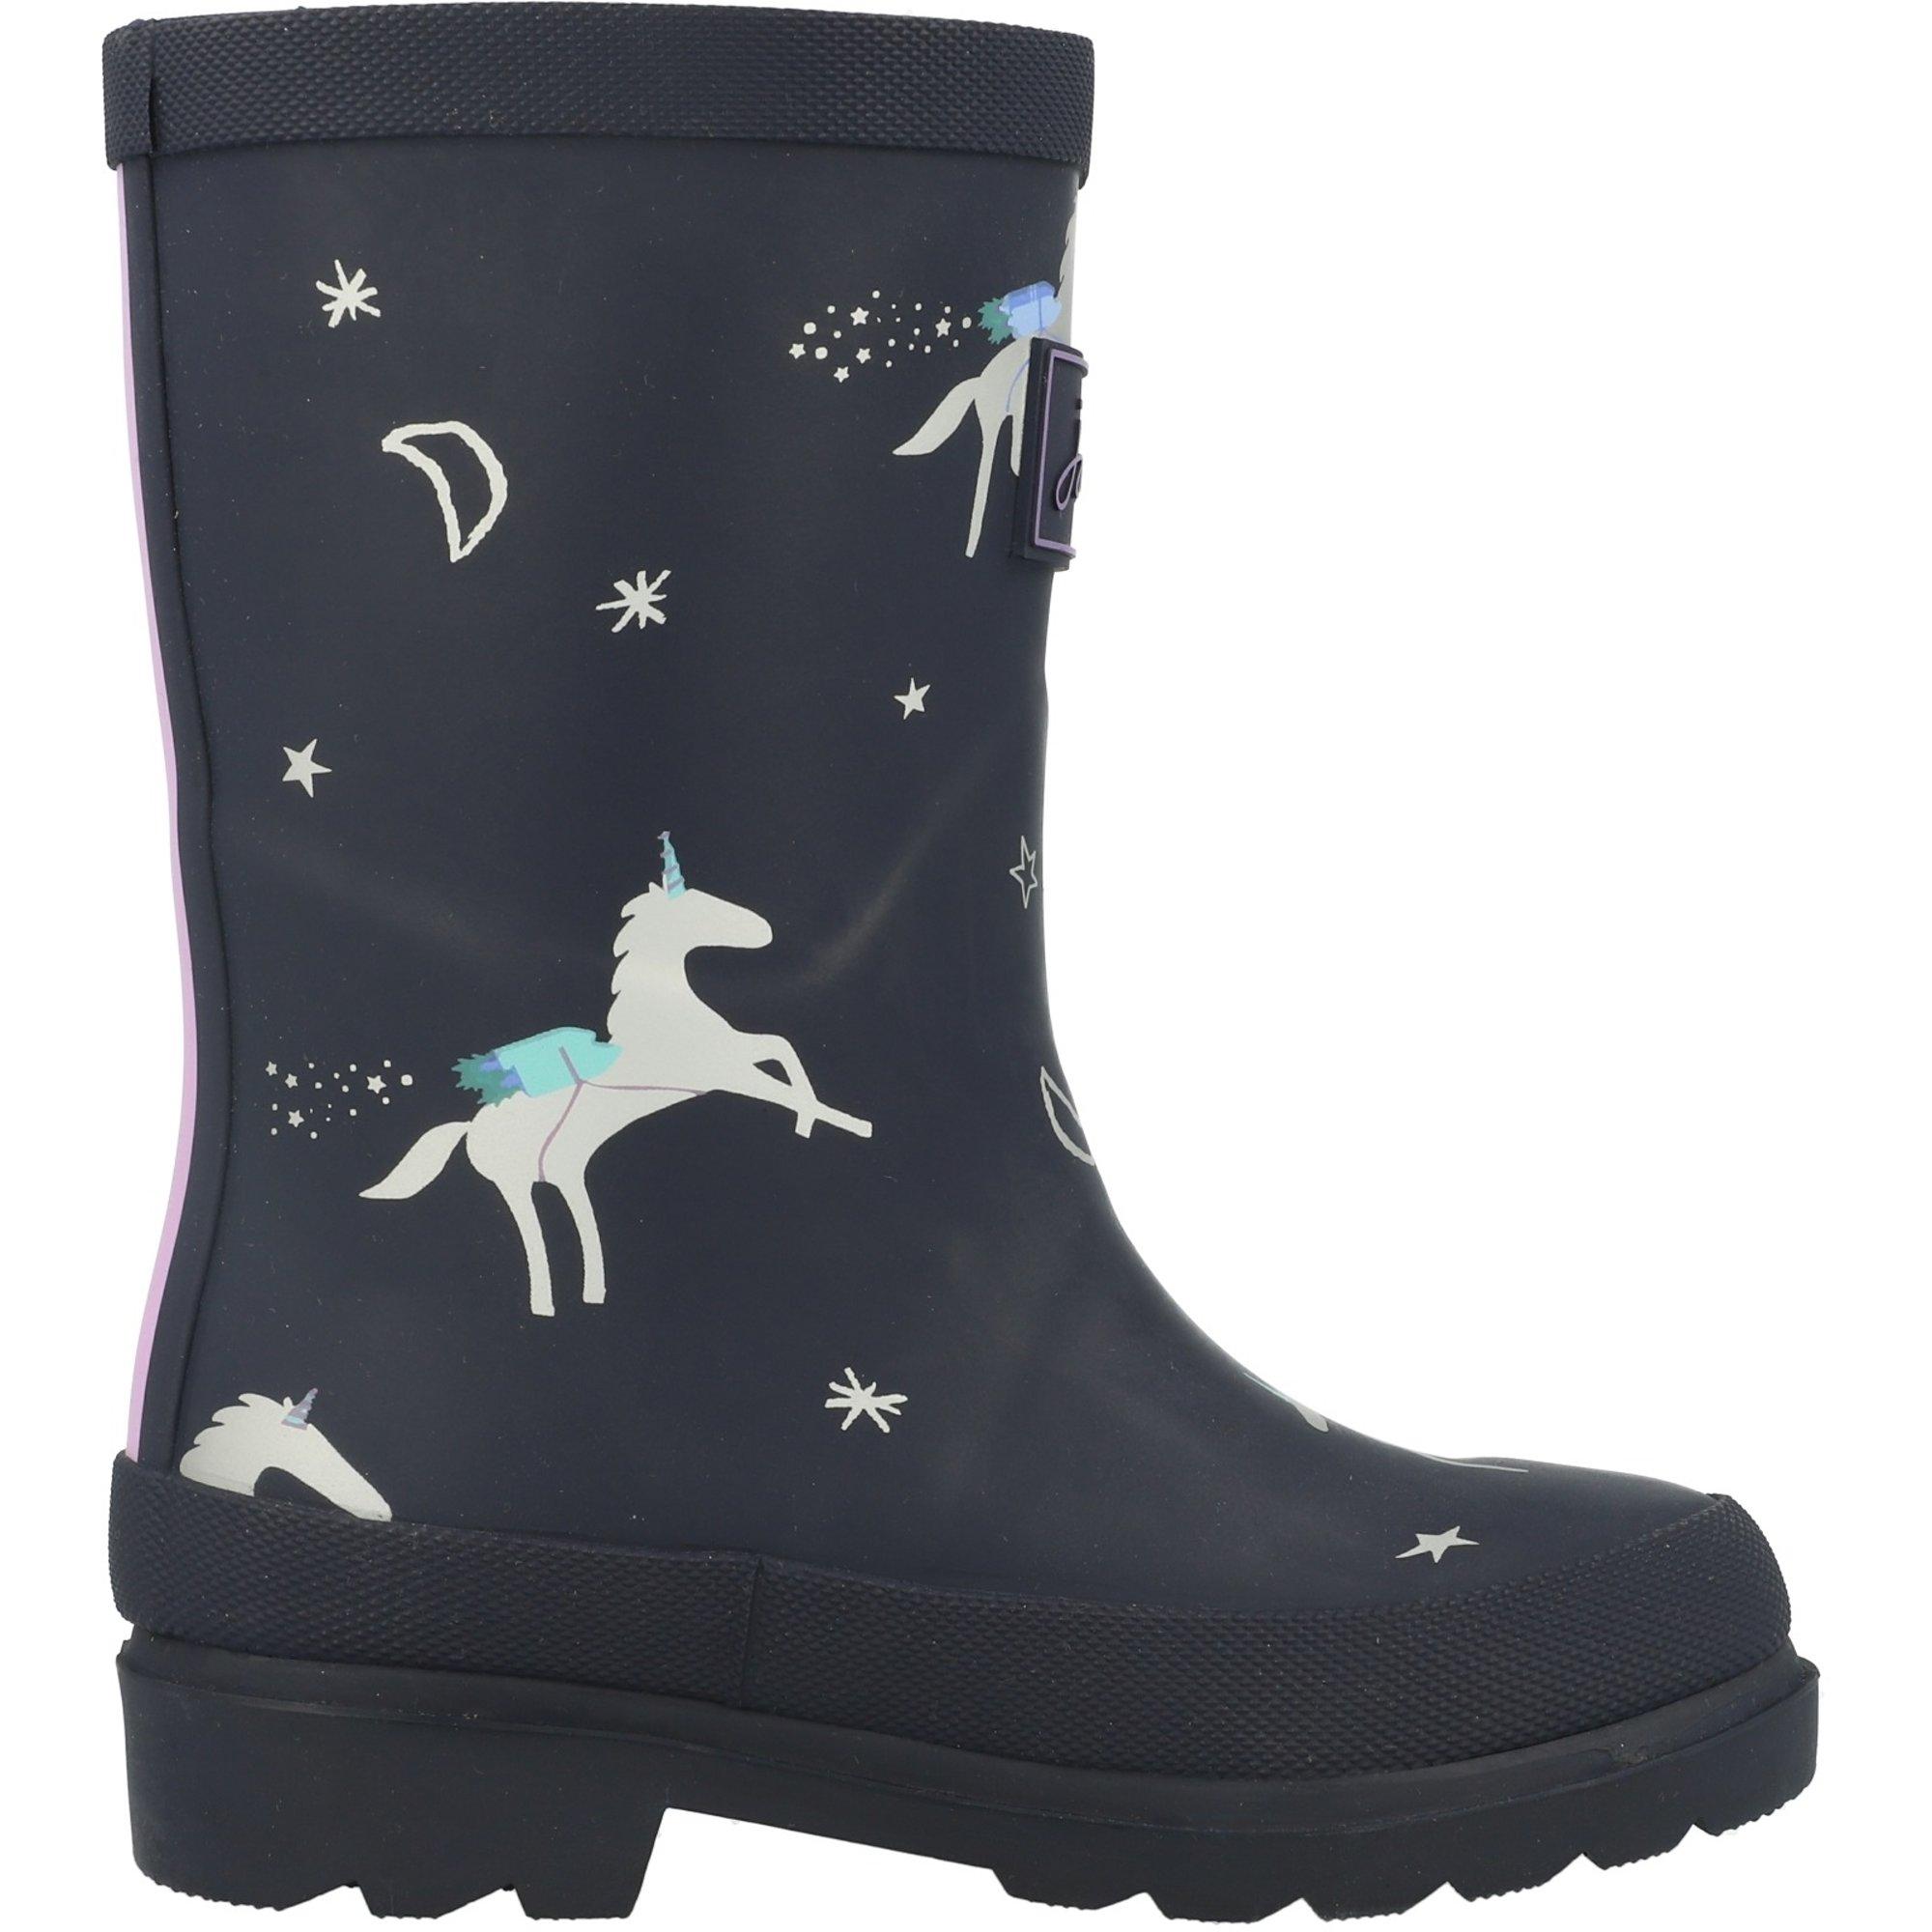 Kids Girls Boys Unicorn Wellington Boots Antip-slip Rain Snow Wellies Shoes Size